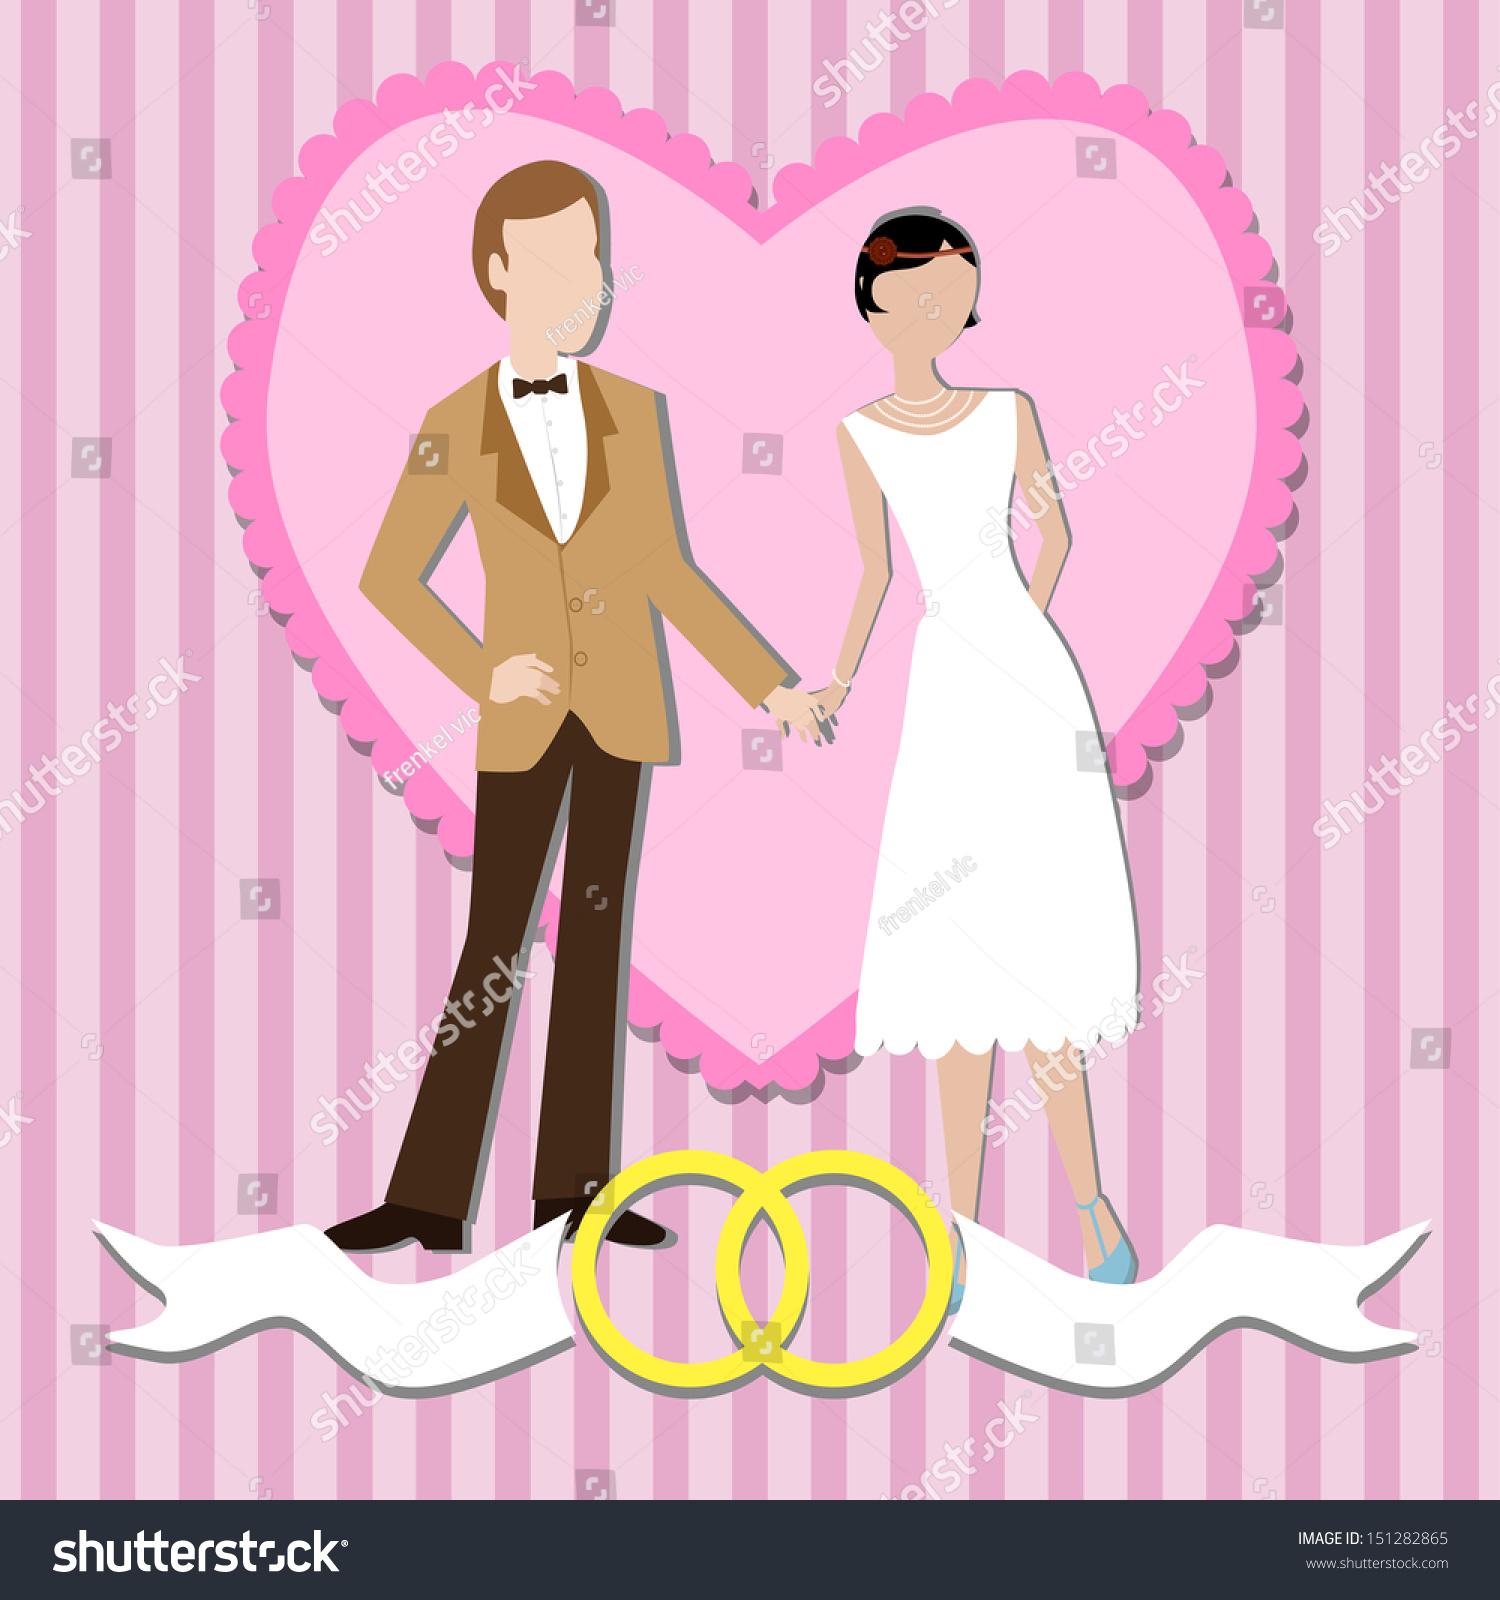 Wedding Invitation Wedding Couple Cute Cartoon Stock Vector ...